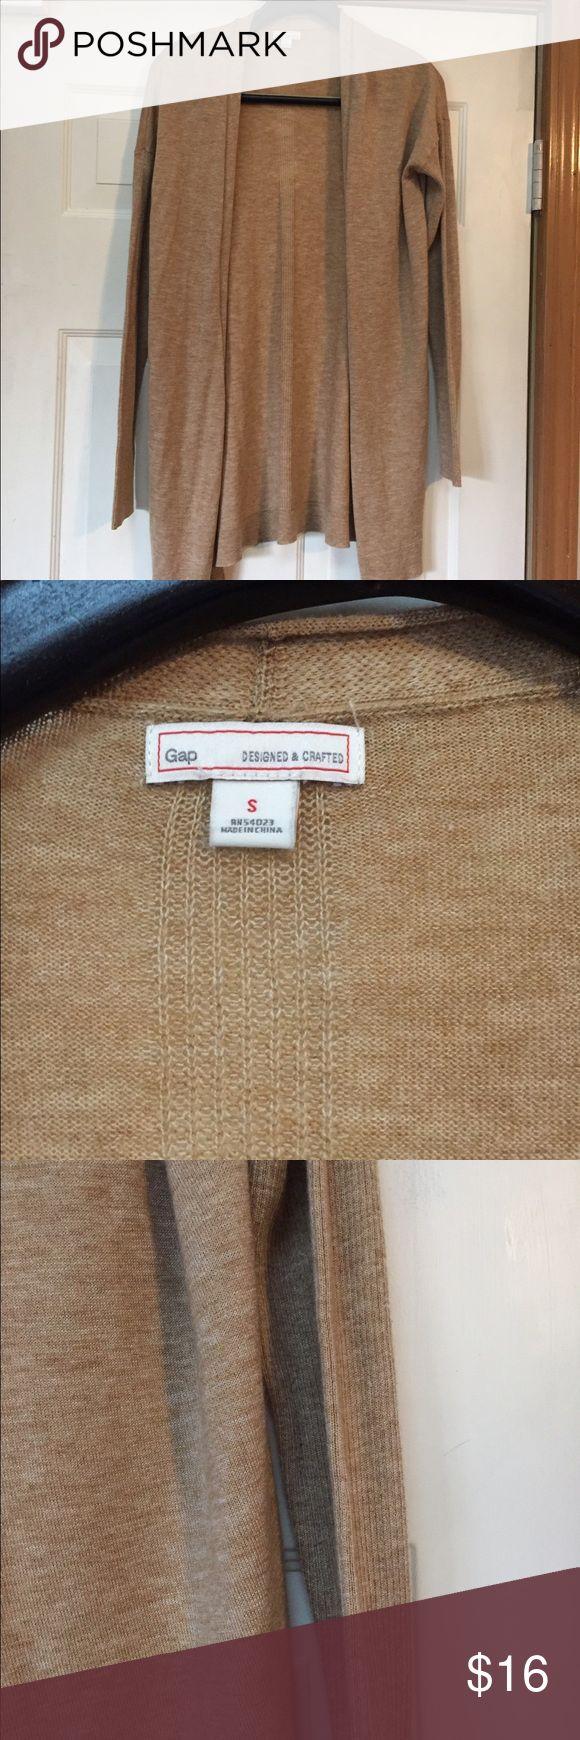 Gap camel cardigan ( thin weight) small EUC No piling. Smoke and pet free home . Bundle discount 20% GAP Sweaters Cardigans